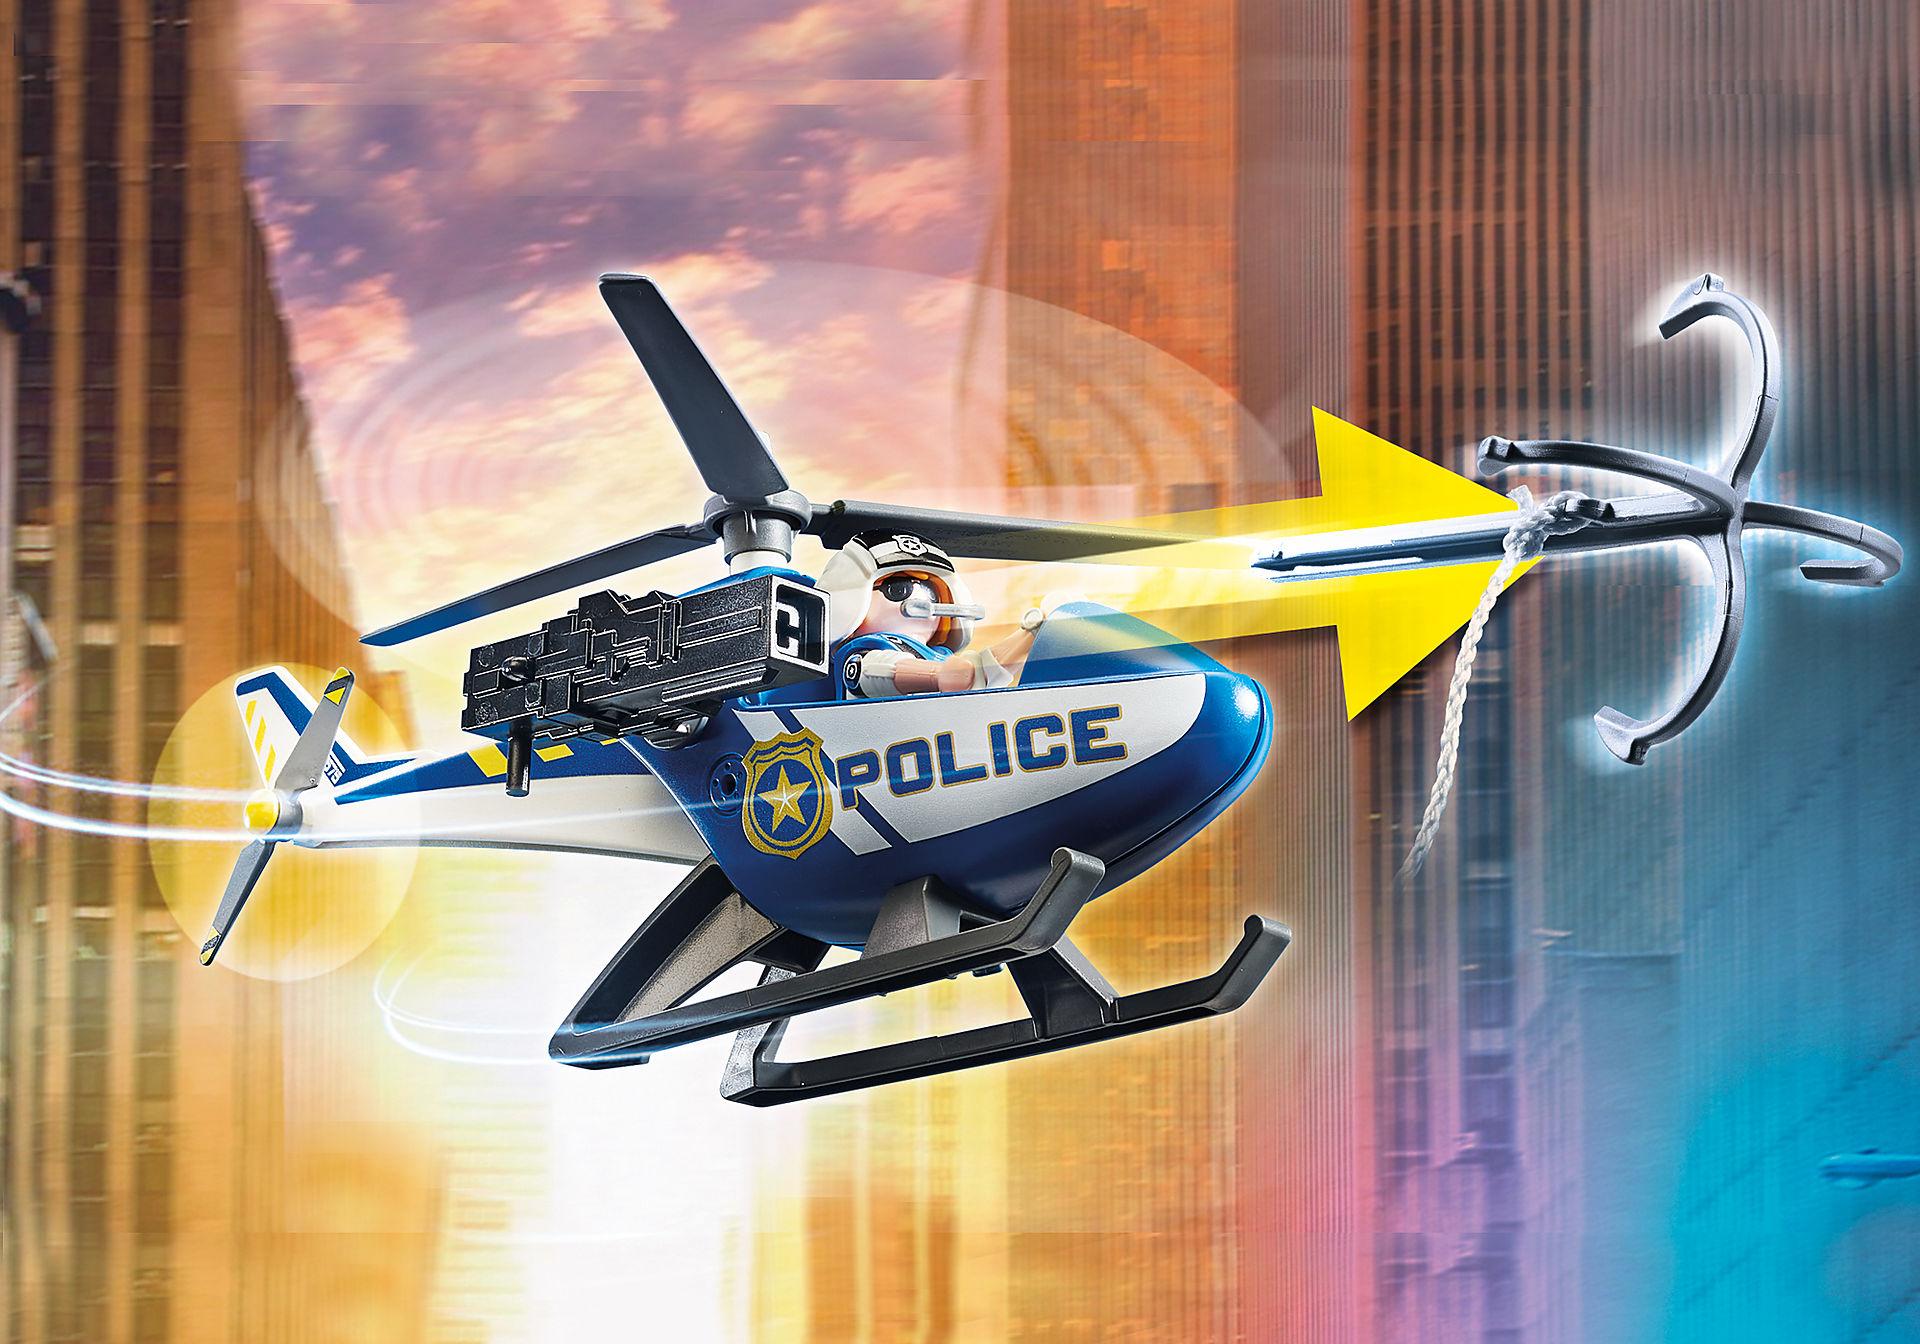 70575 Helicopter Pursuit with Runaway Van zoom image6